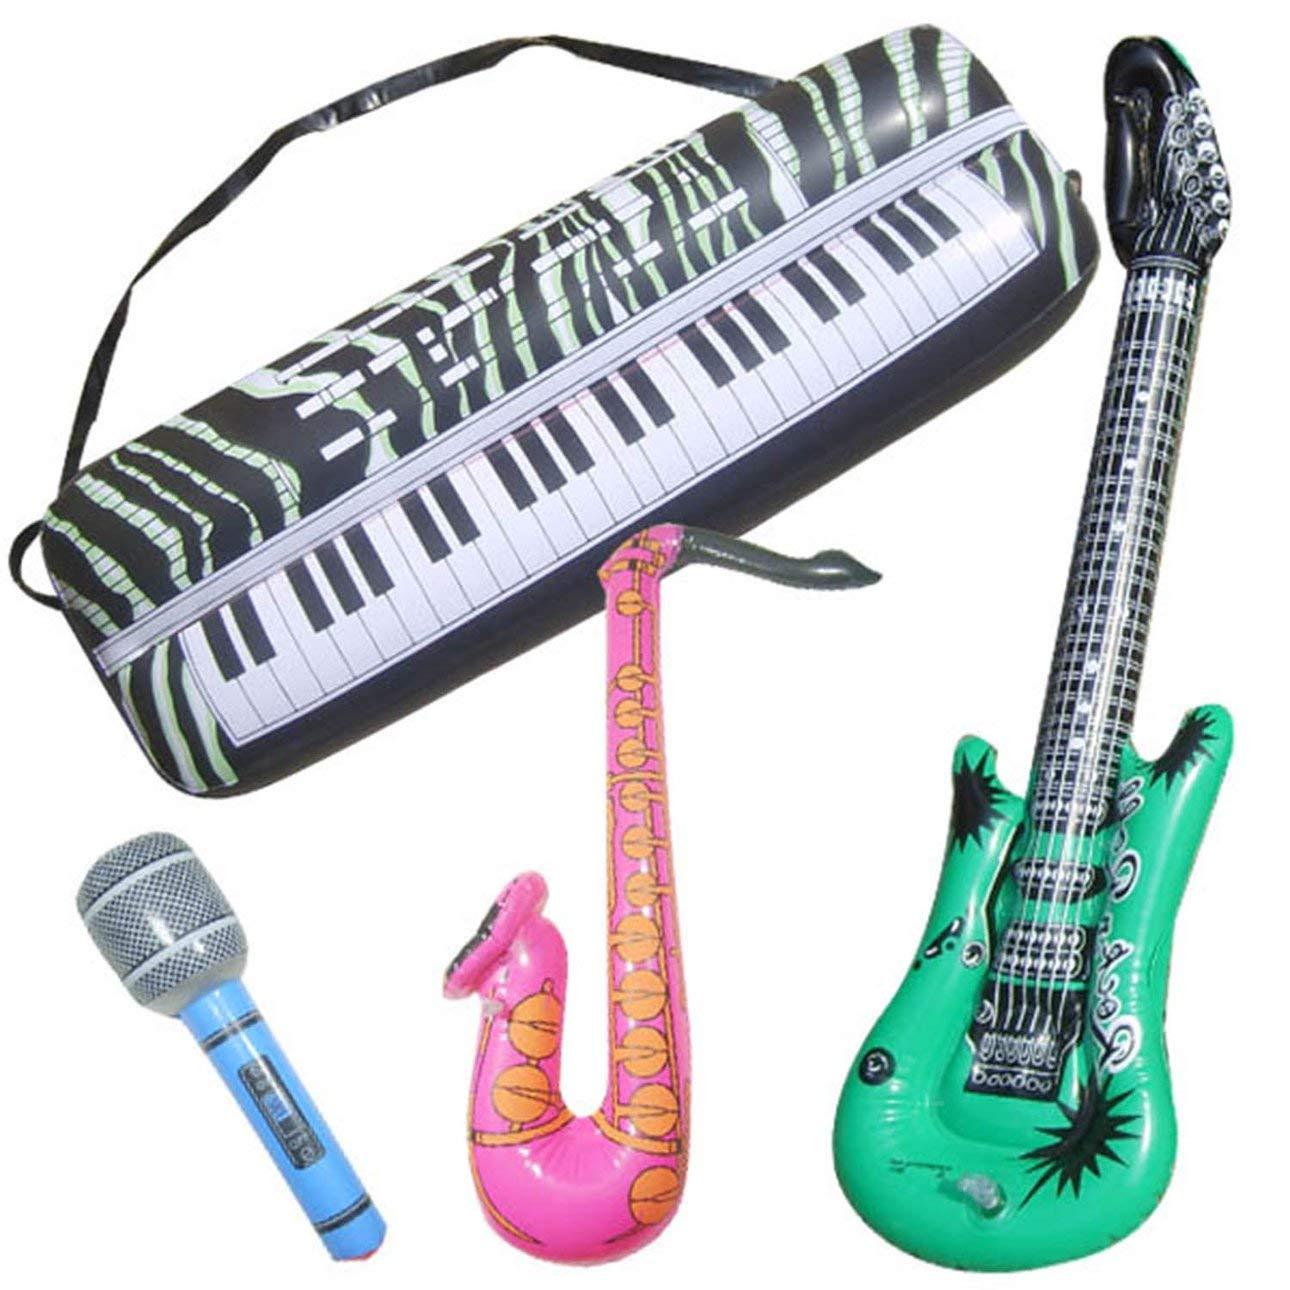 Guitarra hinchable simulada instrumento musical juguete Sax ...